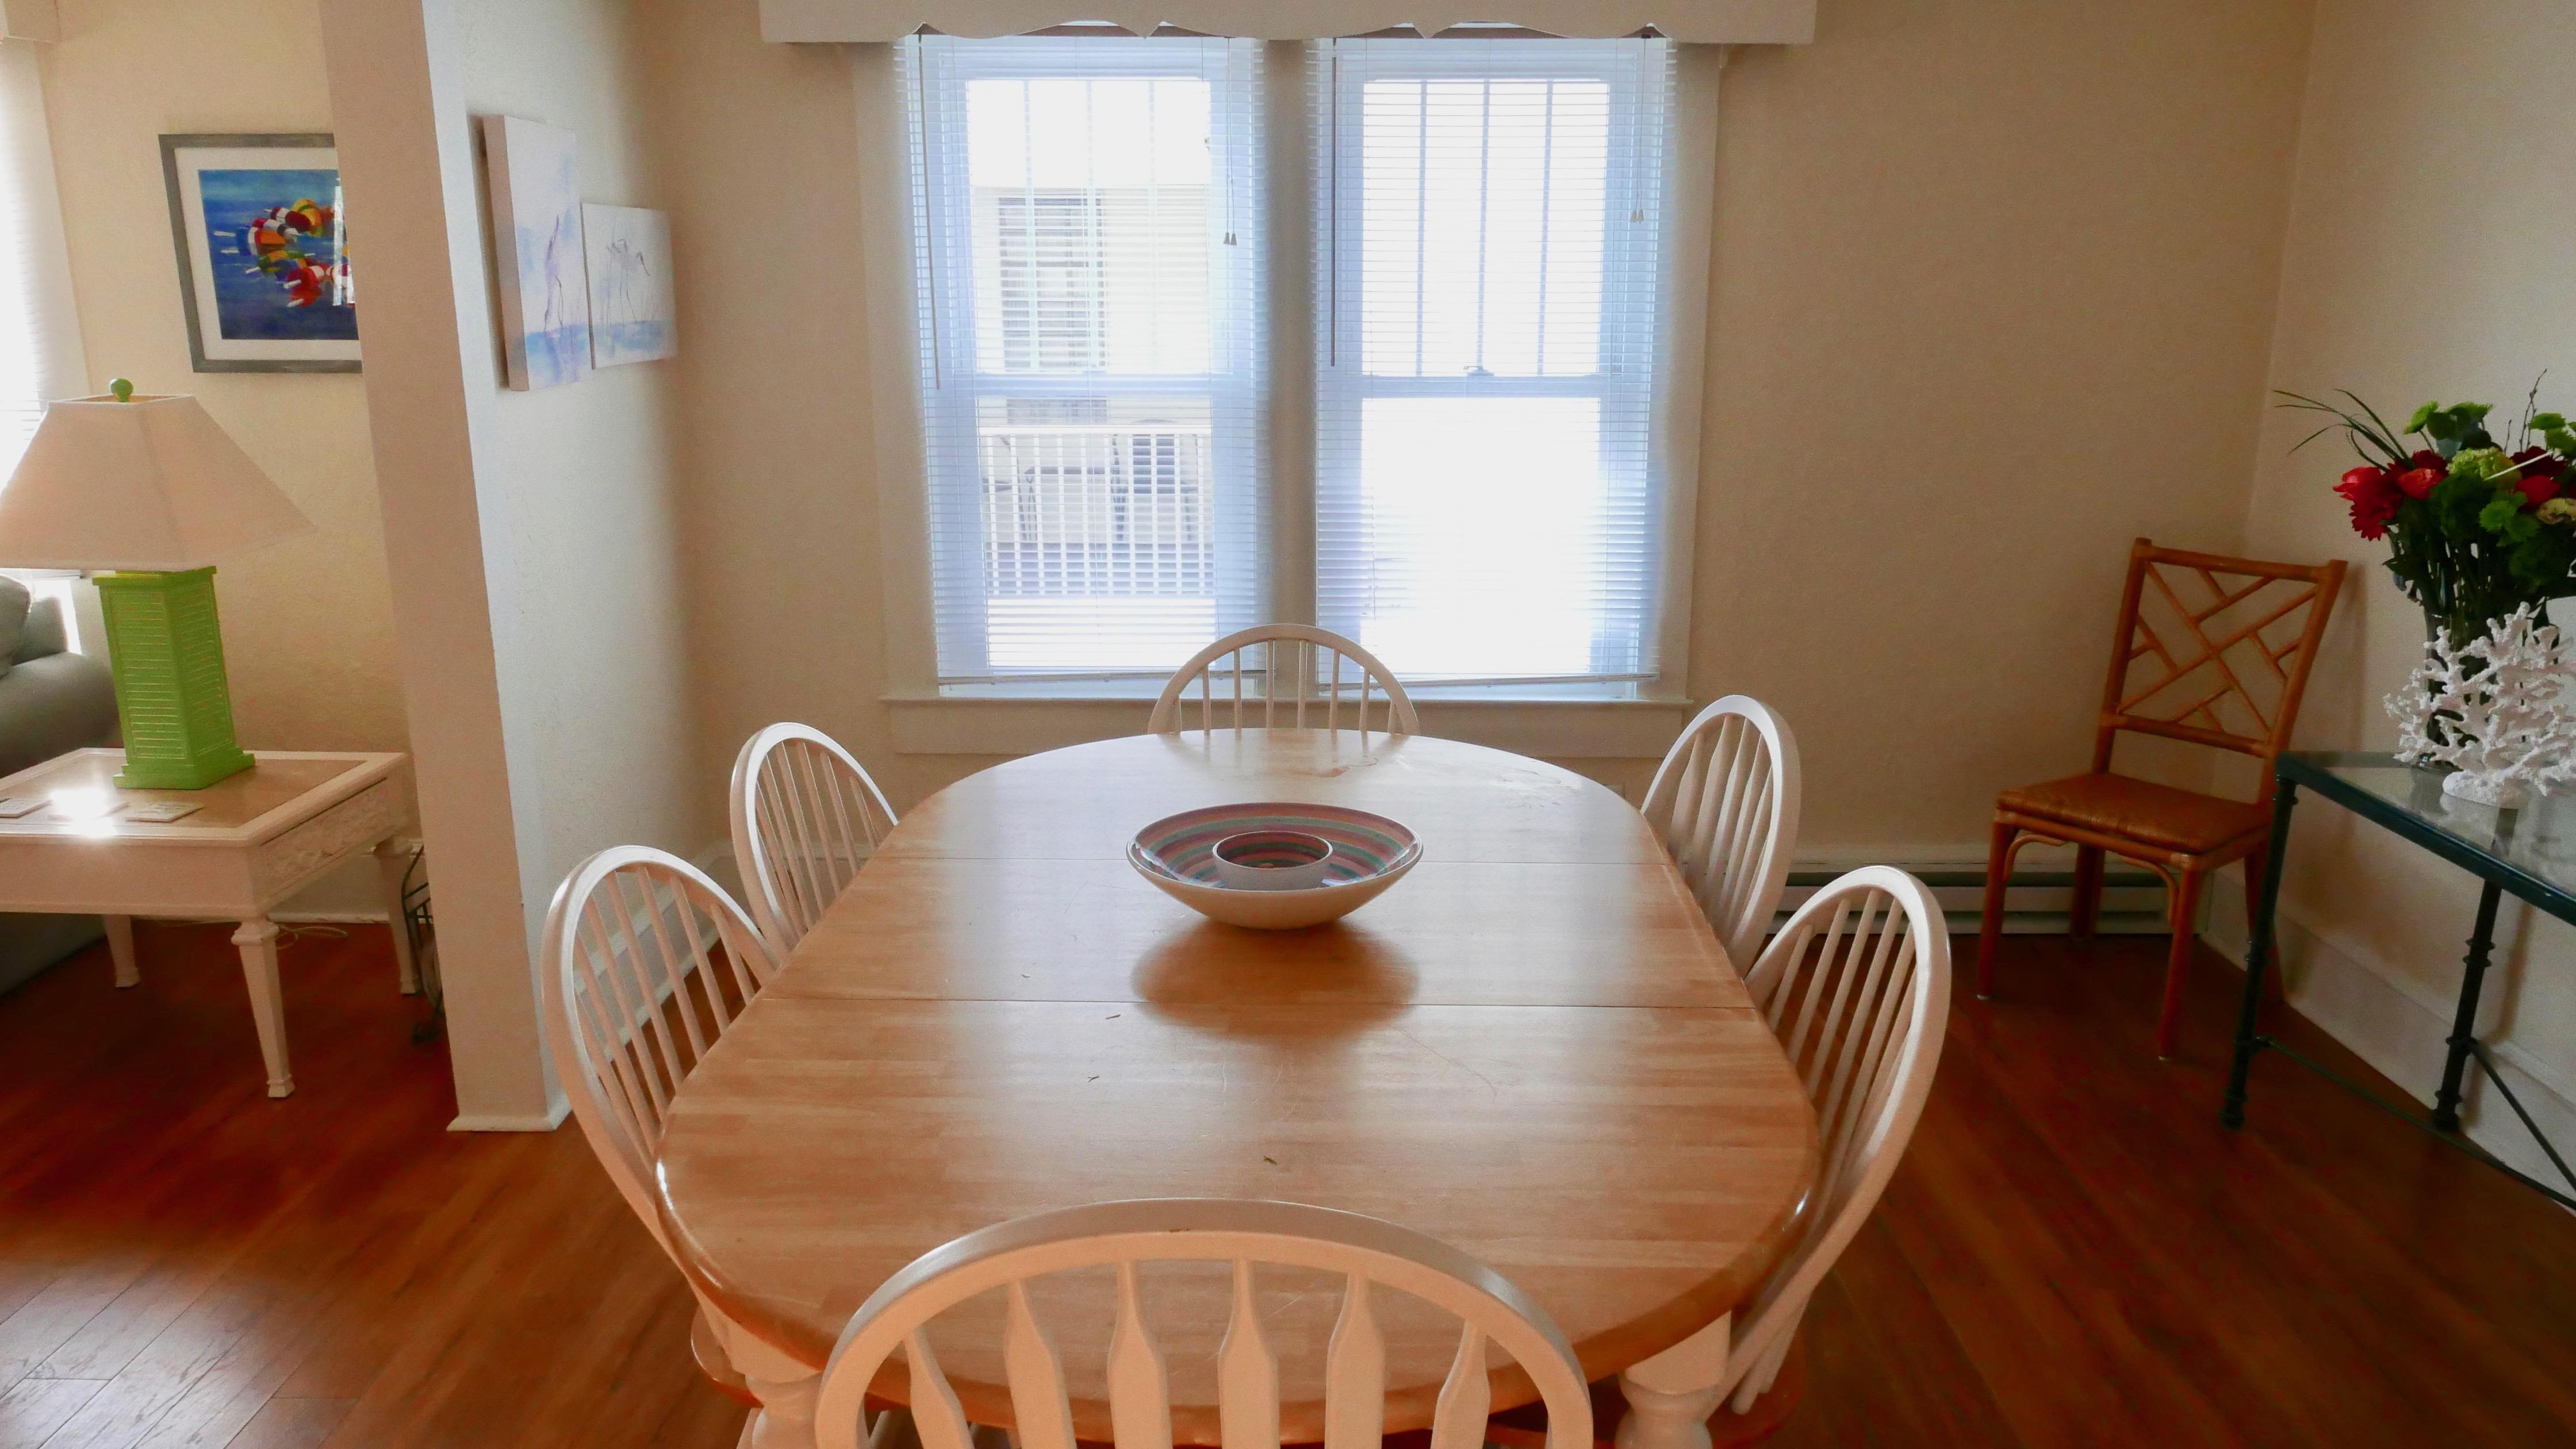 West Side Dining Room